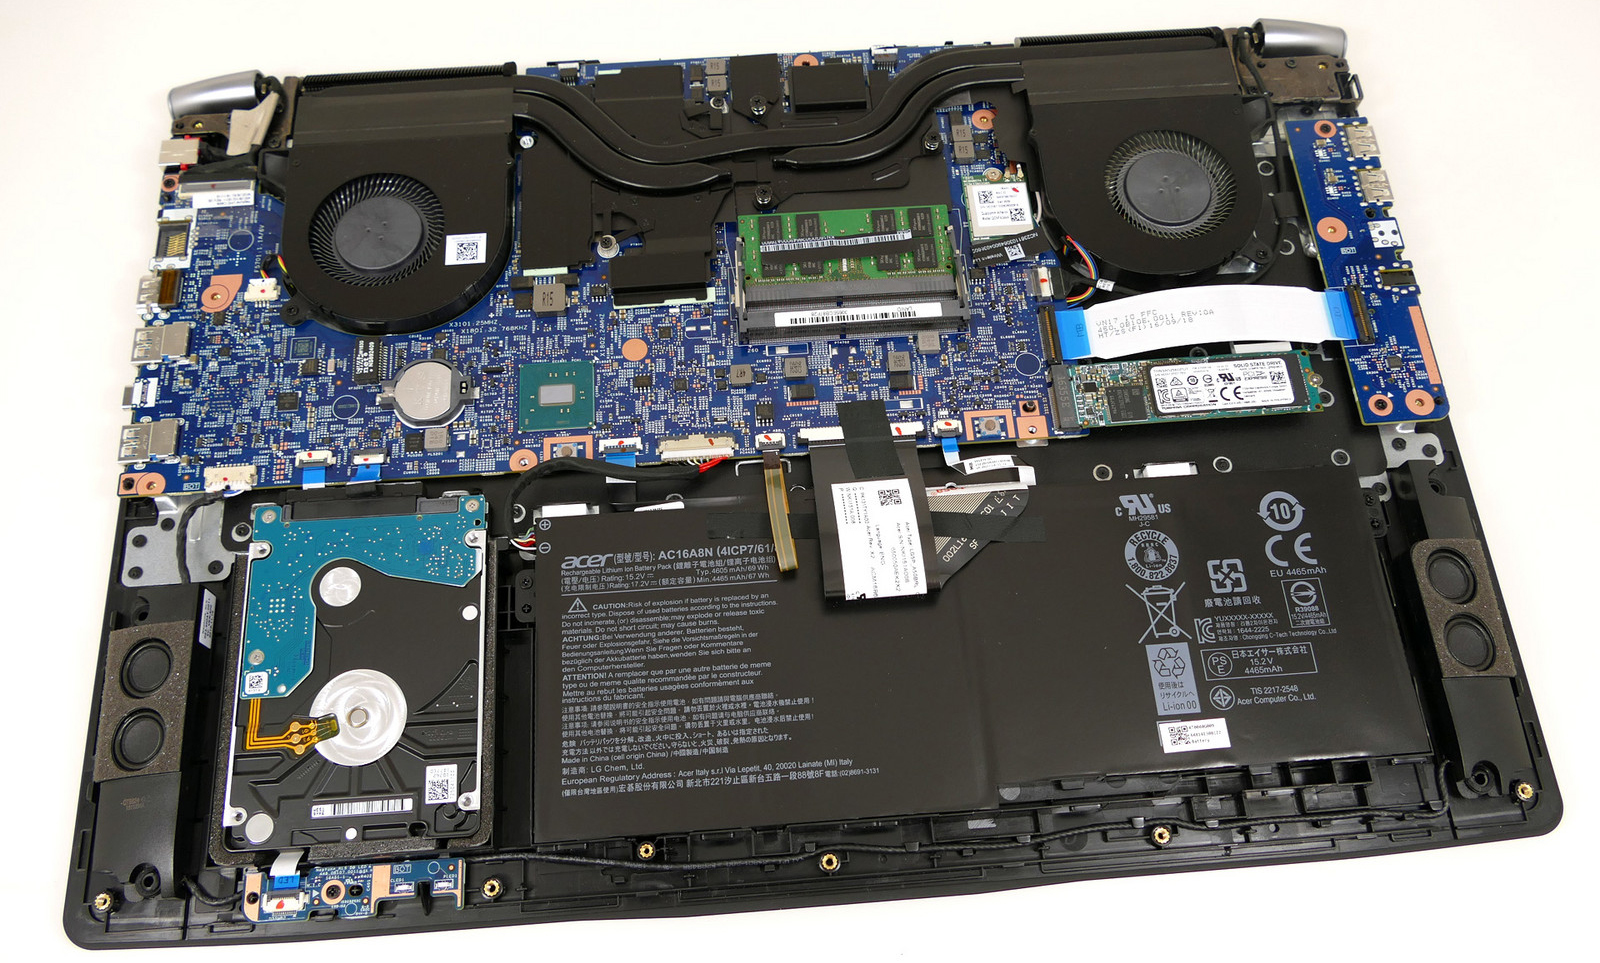 ноутбук Acer VN7-593G на сайте beltexno.by